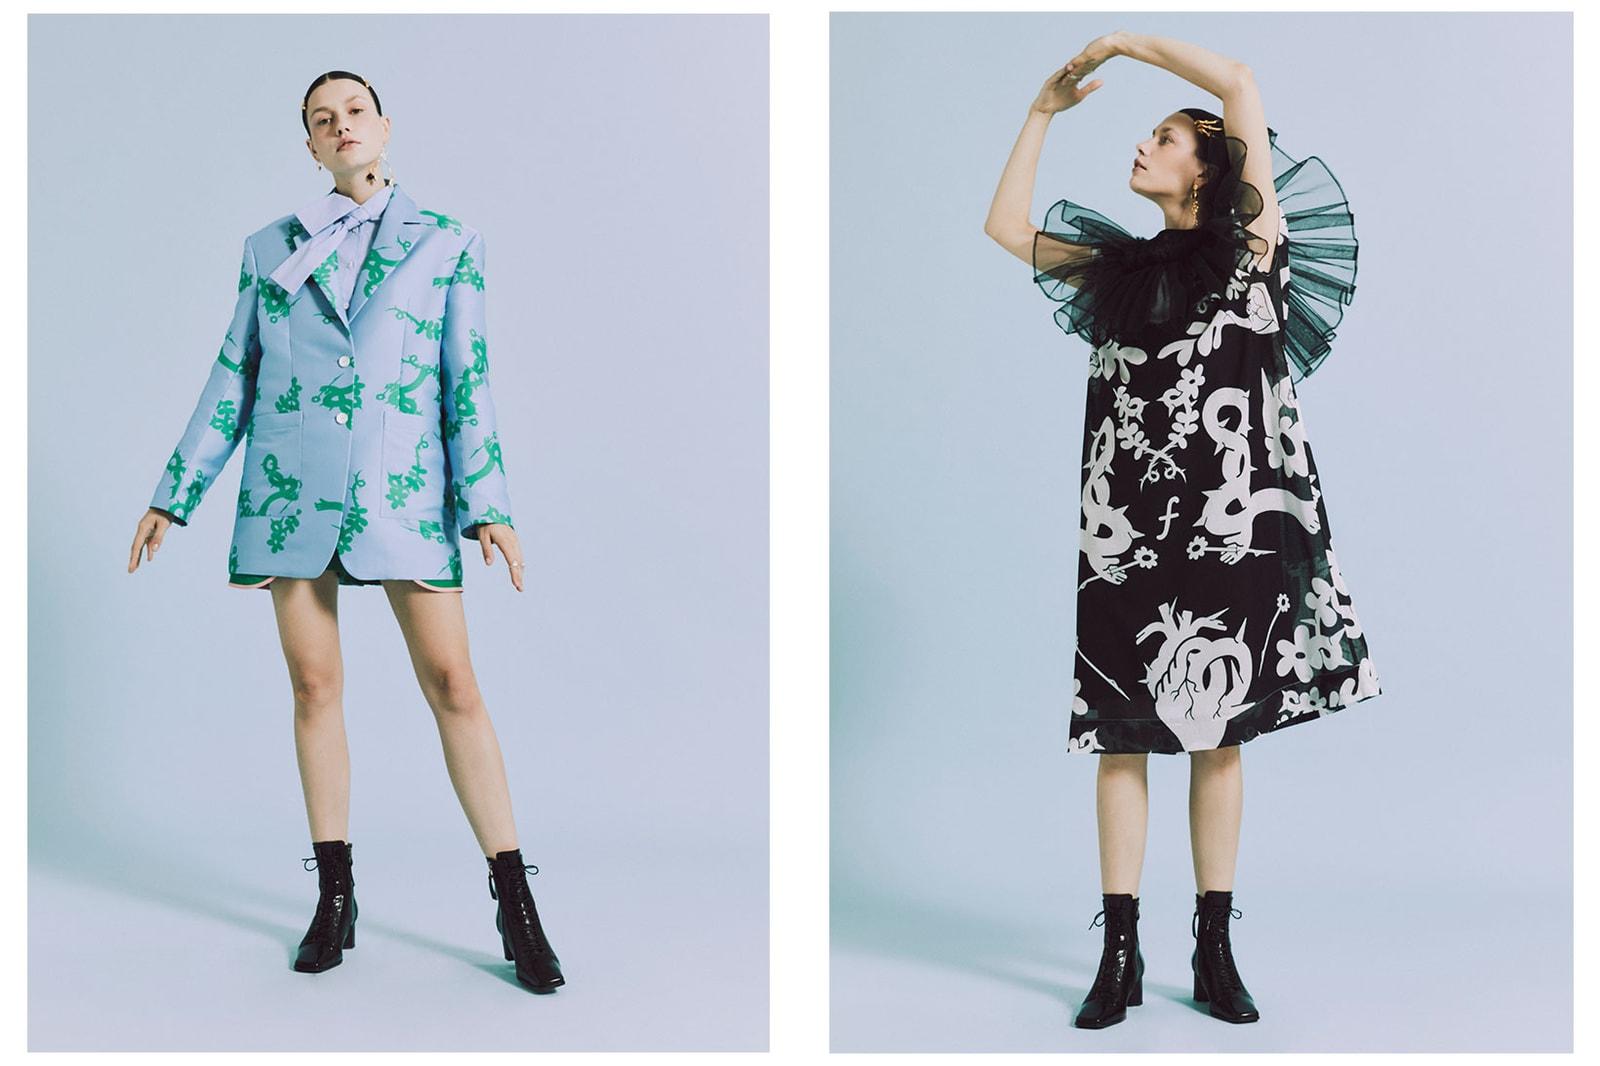 minju kim netflix next in fashion winner interview korean designer dress blue green lookbook